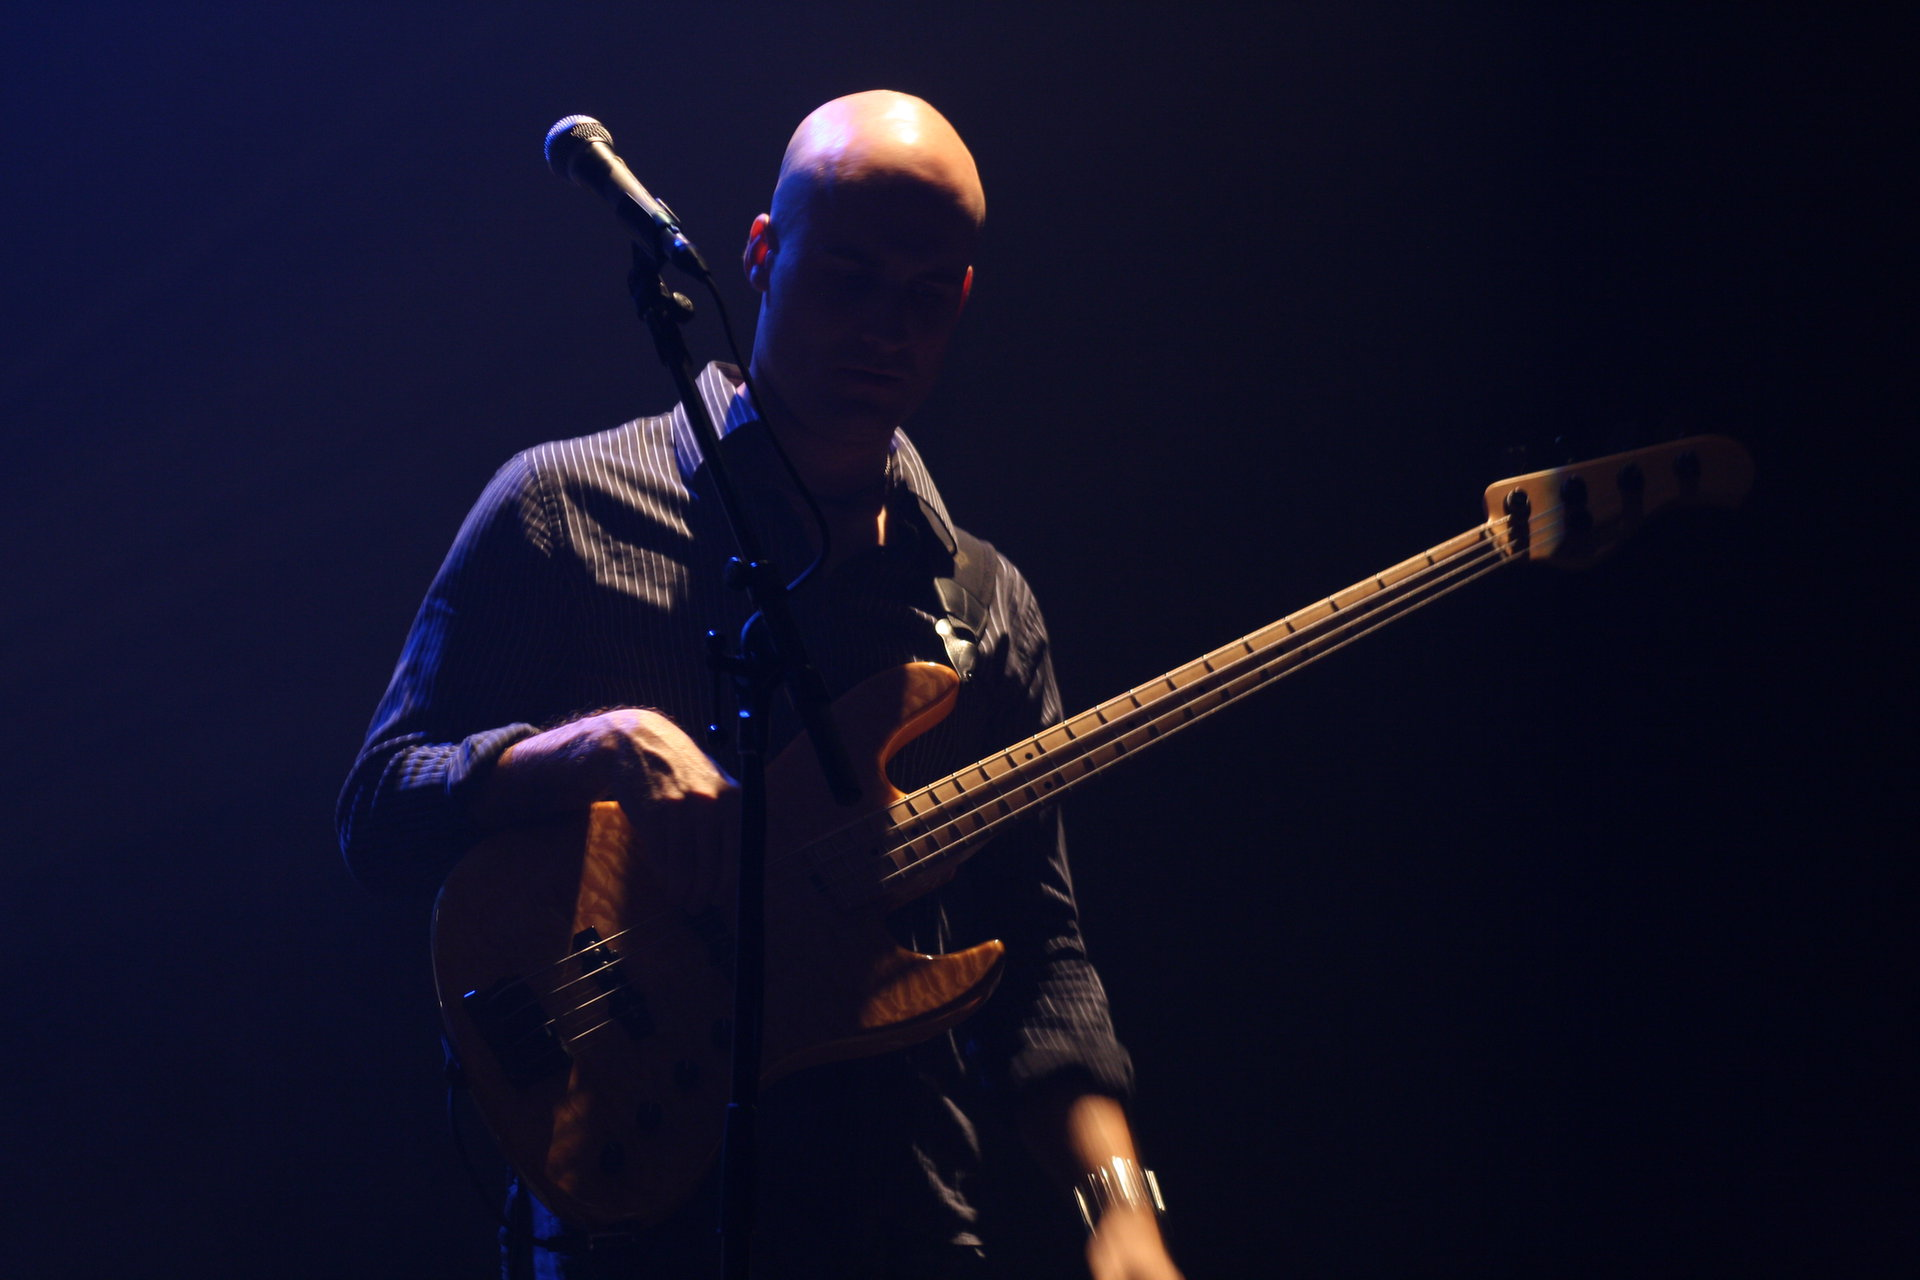 Christian Leclair musique